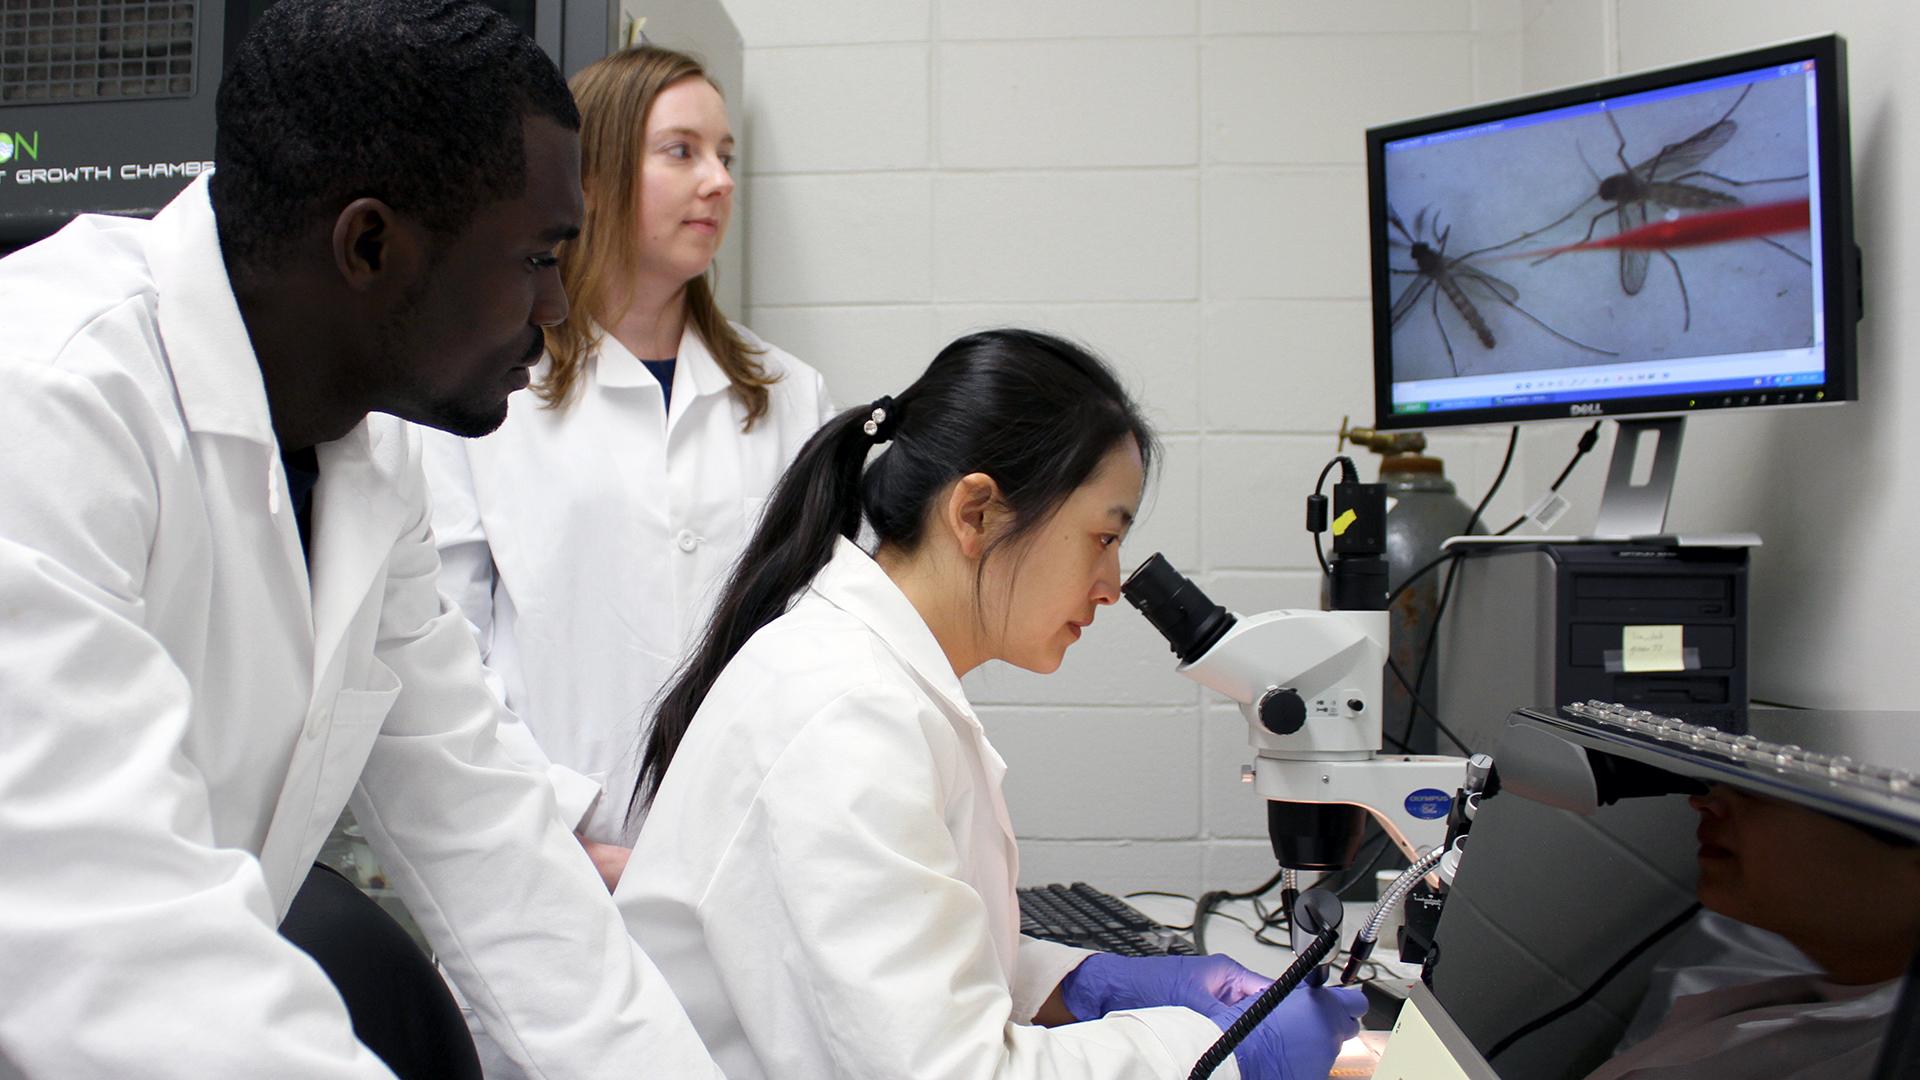 Applied-Biotechnology-Major-Auburn-Alabama-Degree-USA-Entomology-Students-Mosquito-Research-Lab-Coats